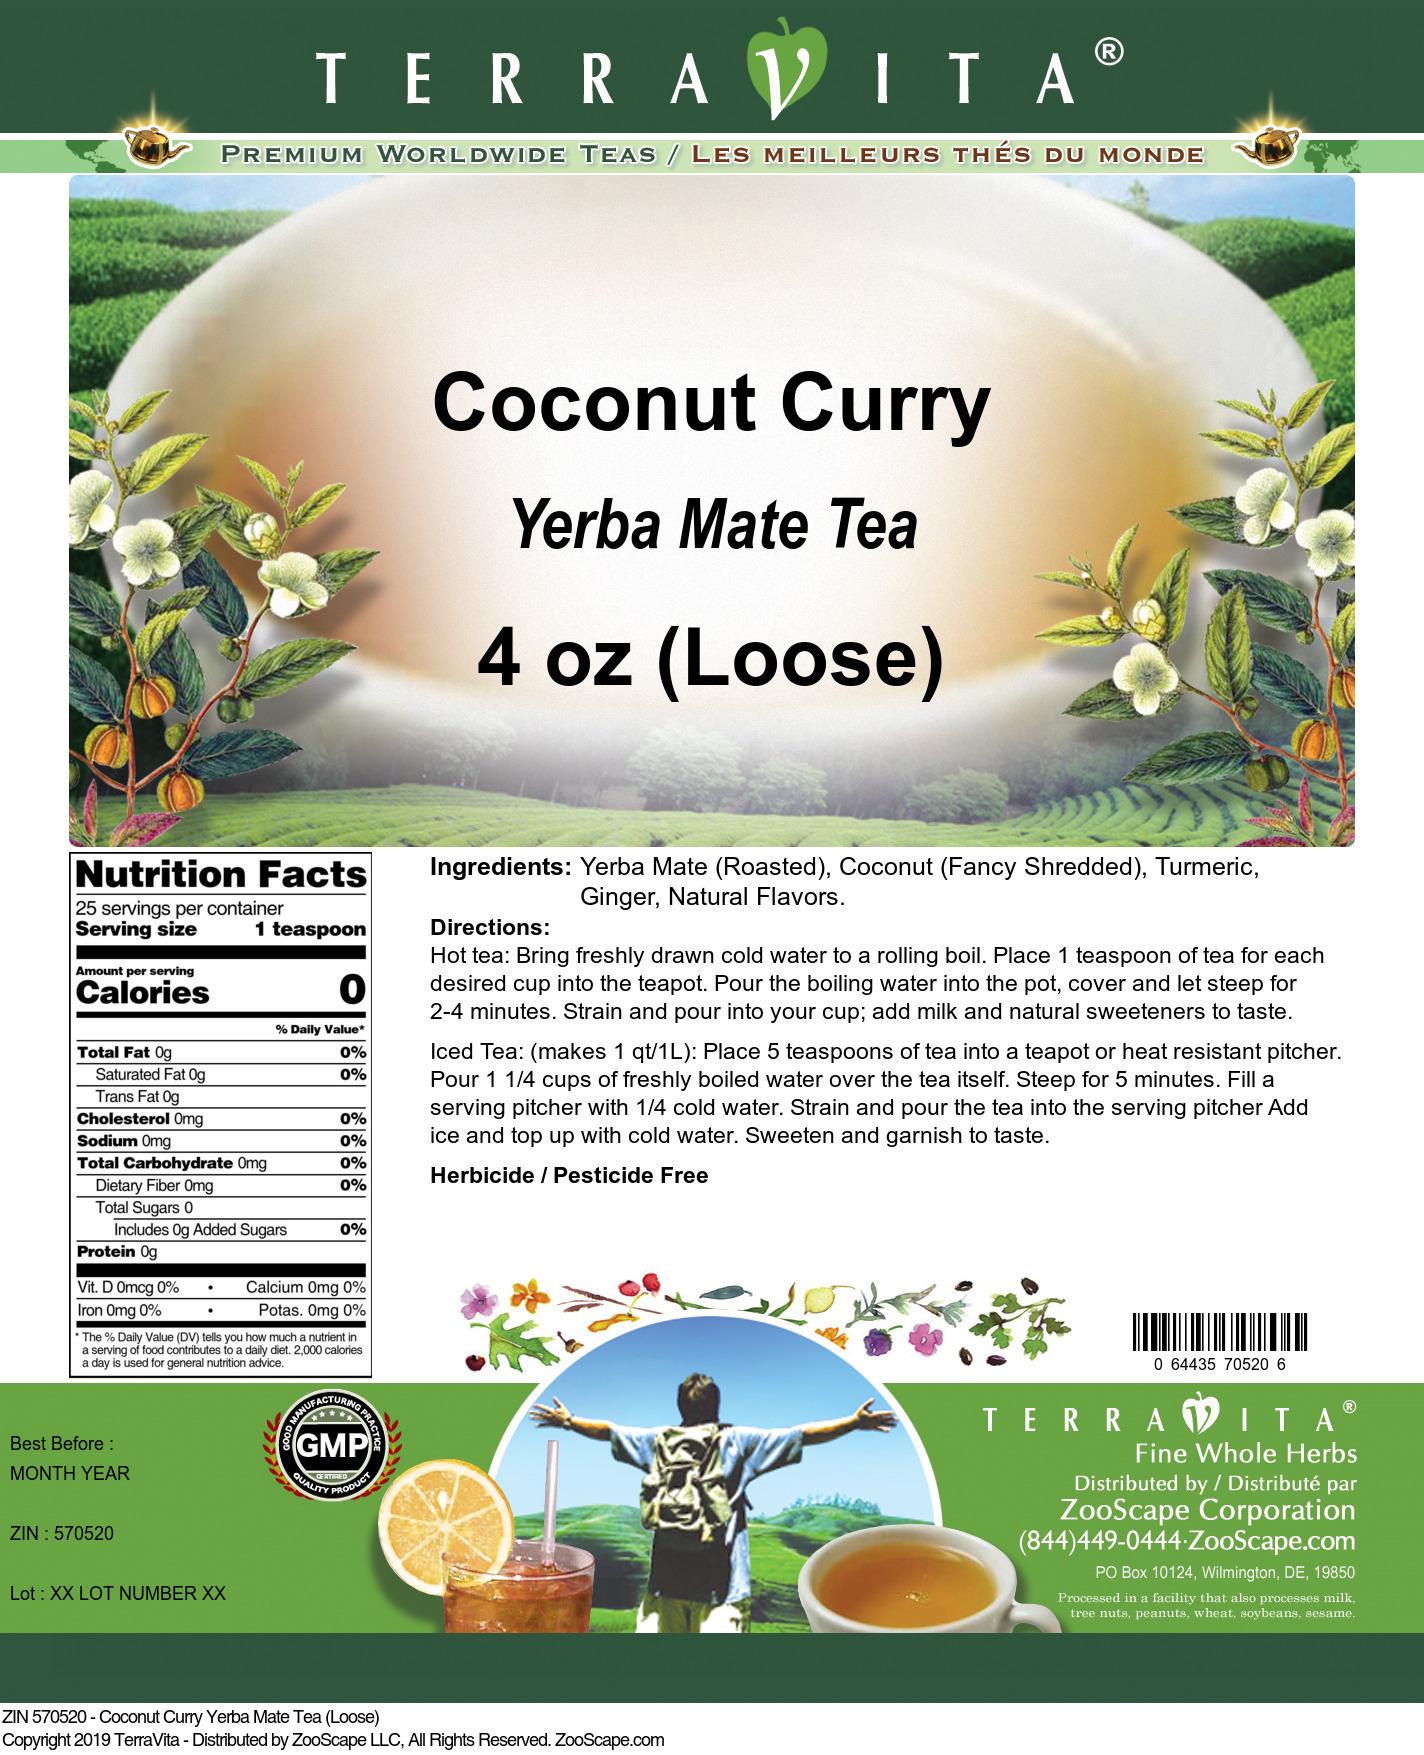 Coconut Curry Yerba Mate Tea (Loose)